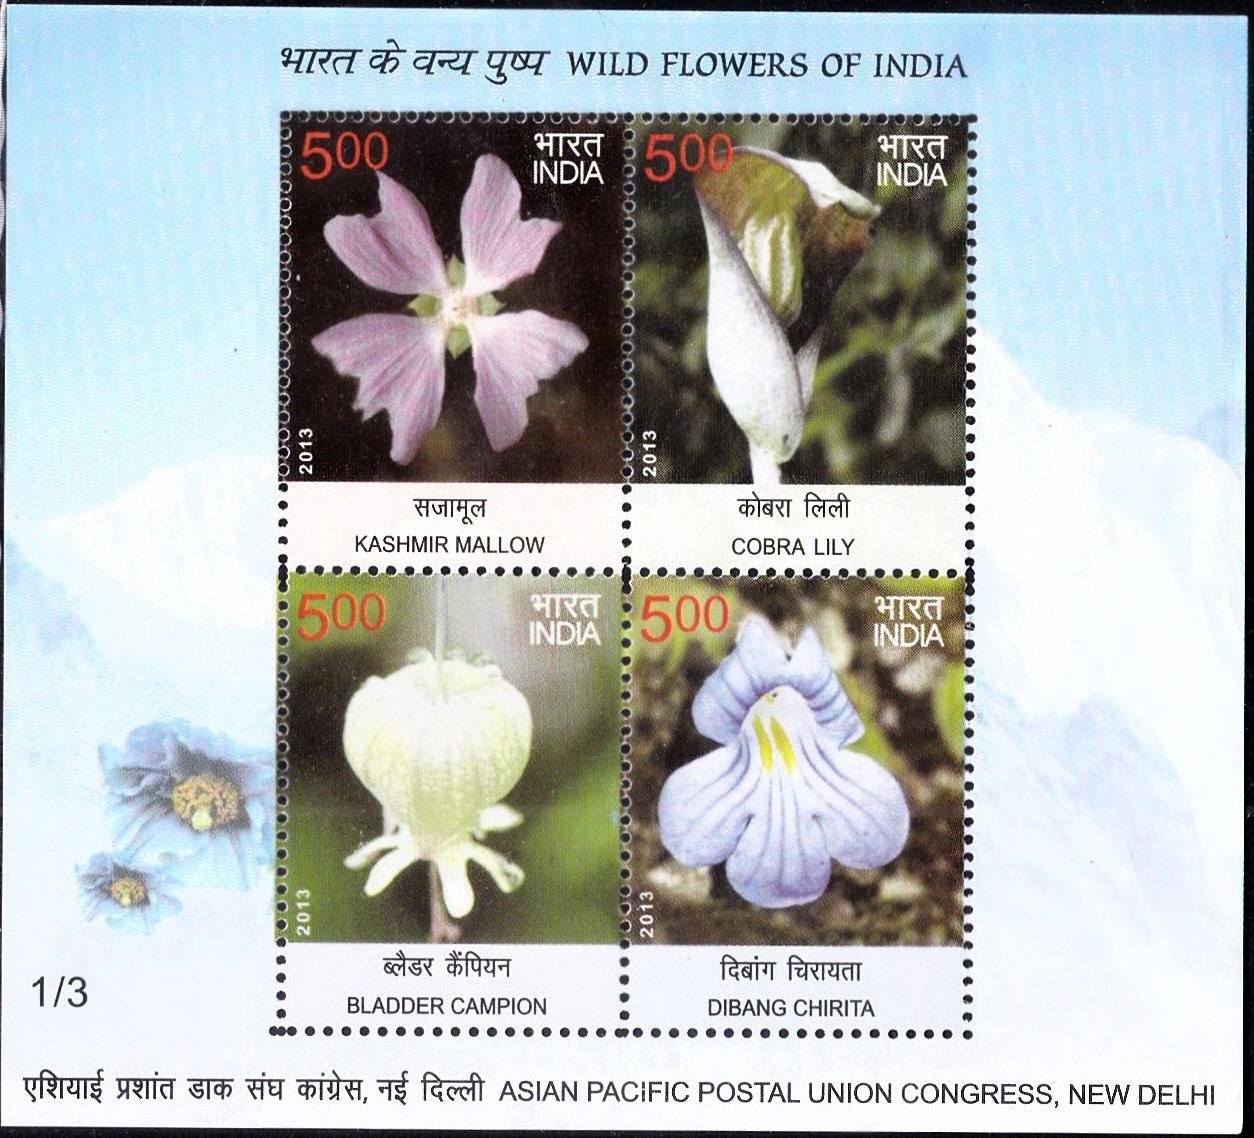 Kashmir Mallow, Cobra Lily, Bladder Campion & Dibang Chirita